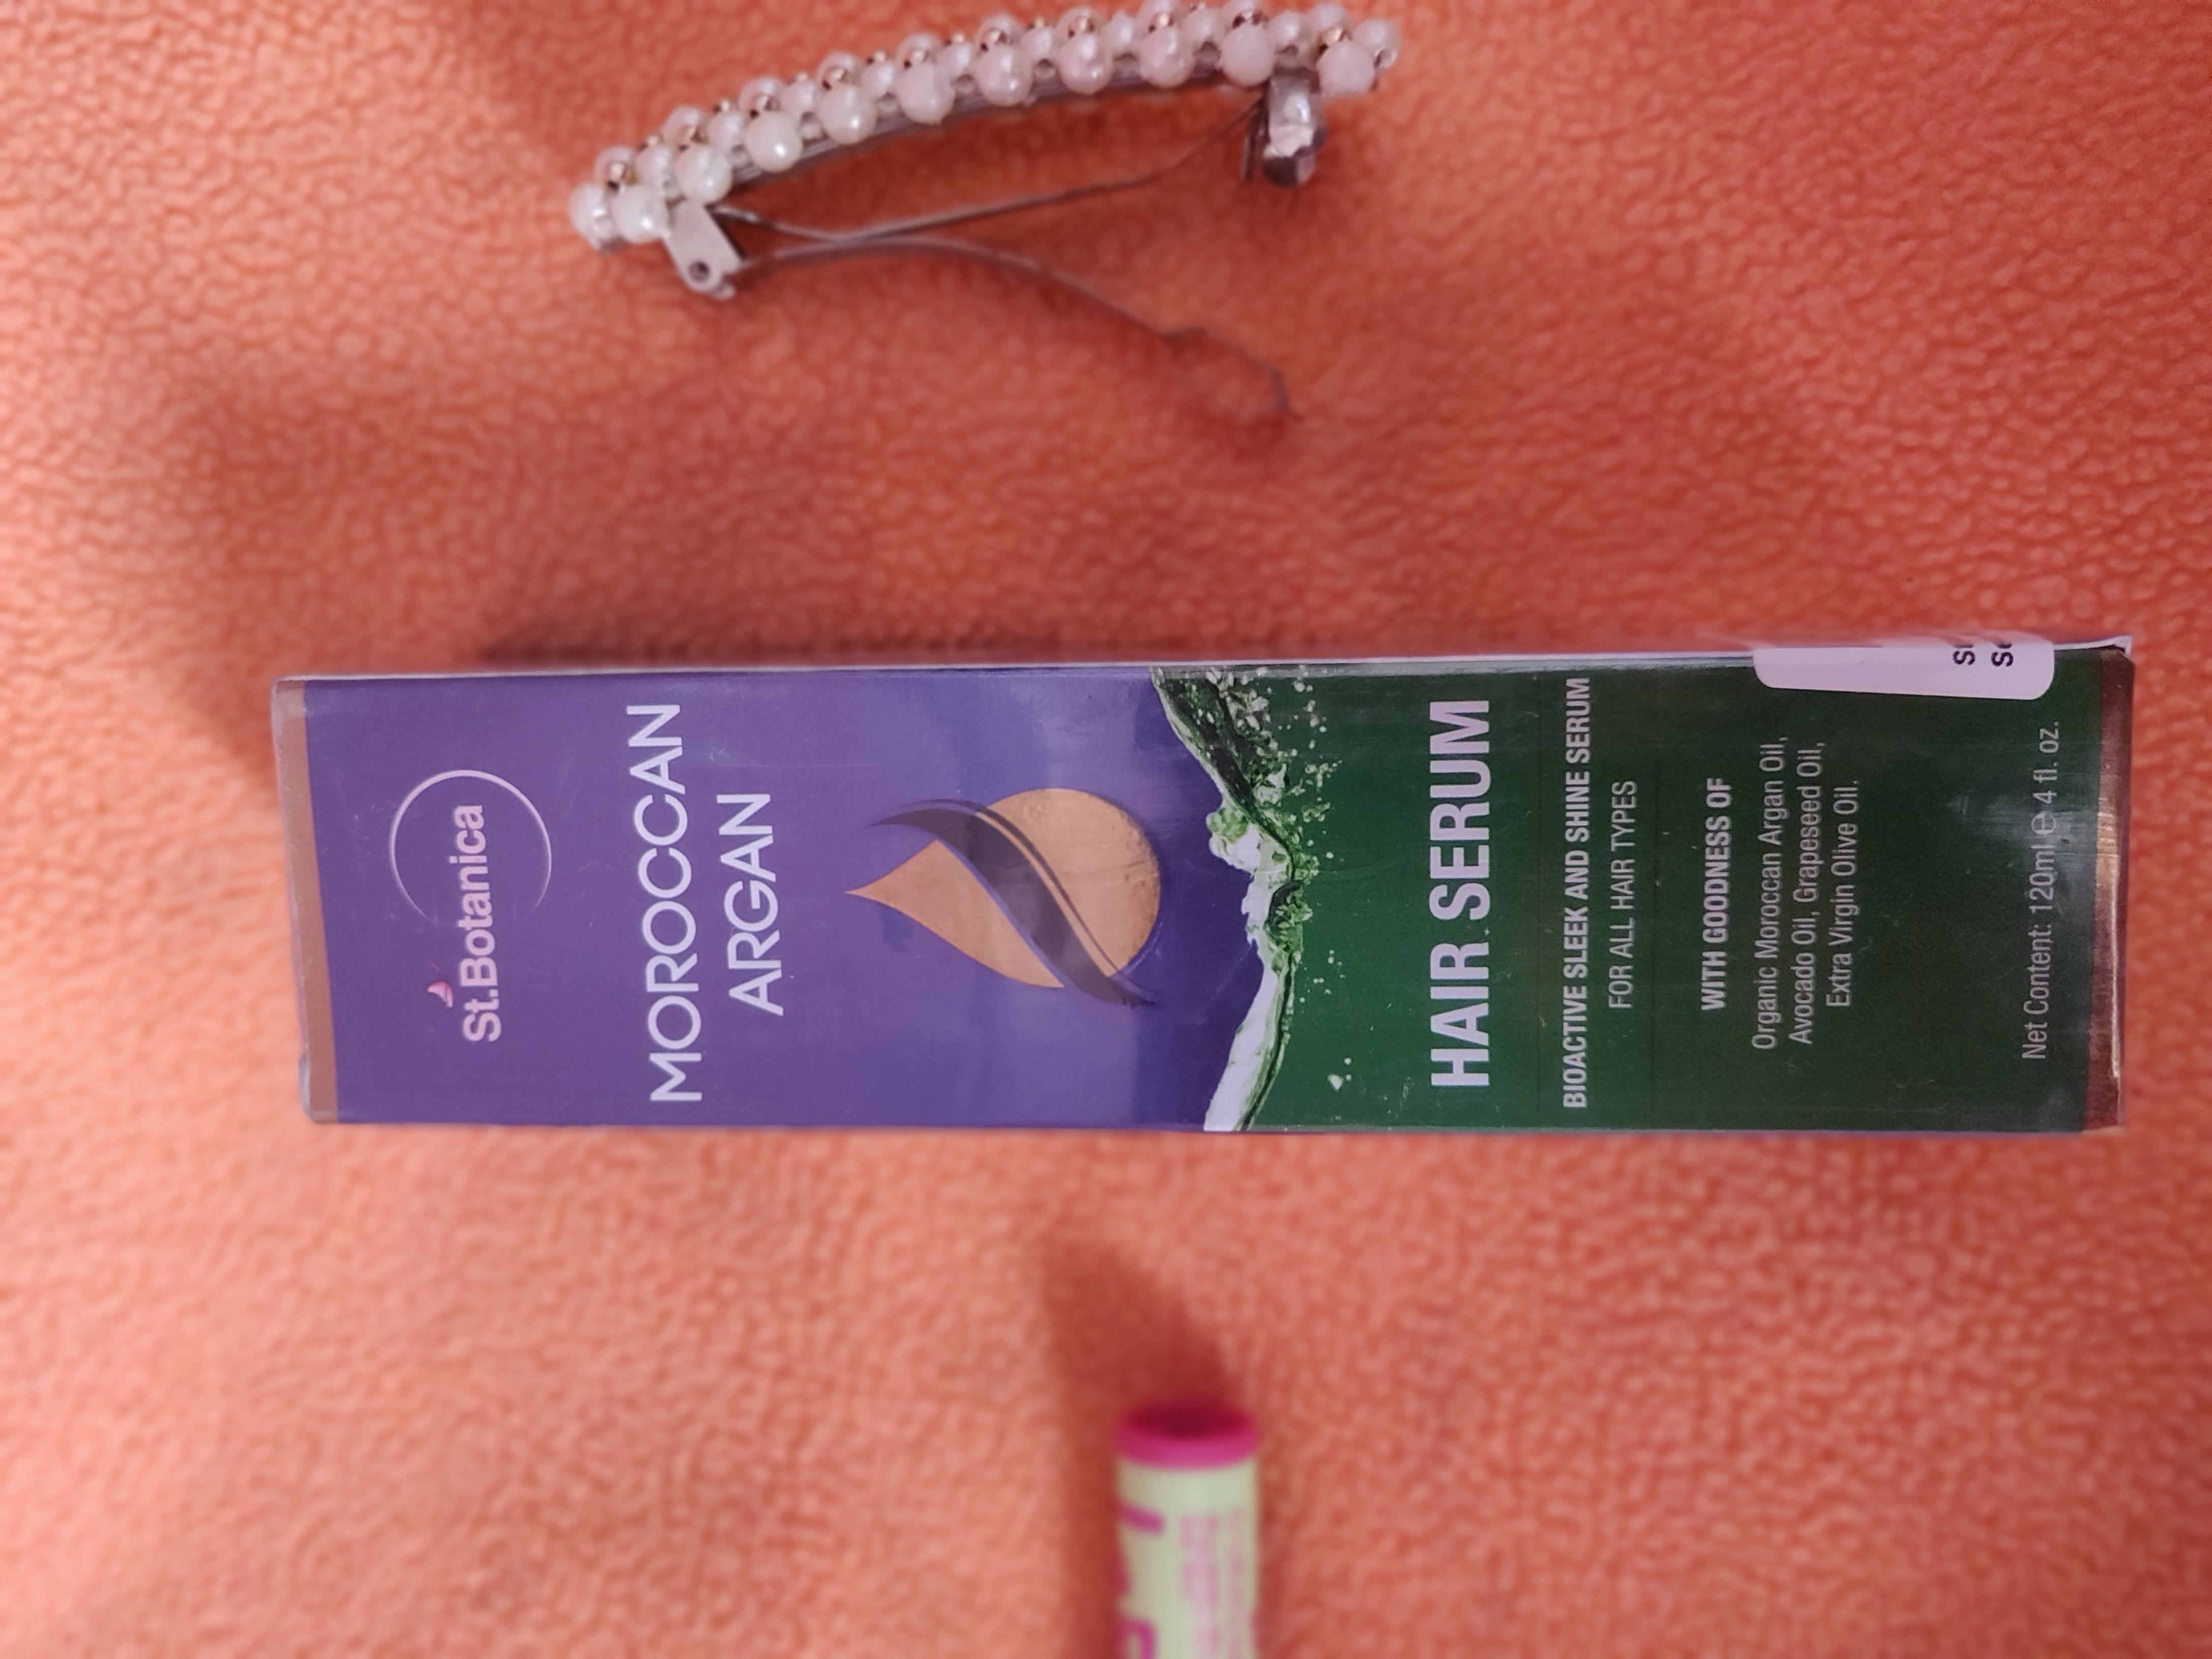 St.Botanica Moroccan Argan Hair Serum-A must try hair serum-By keerthisiva-1